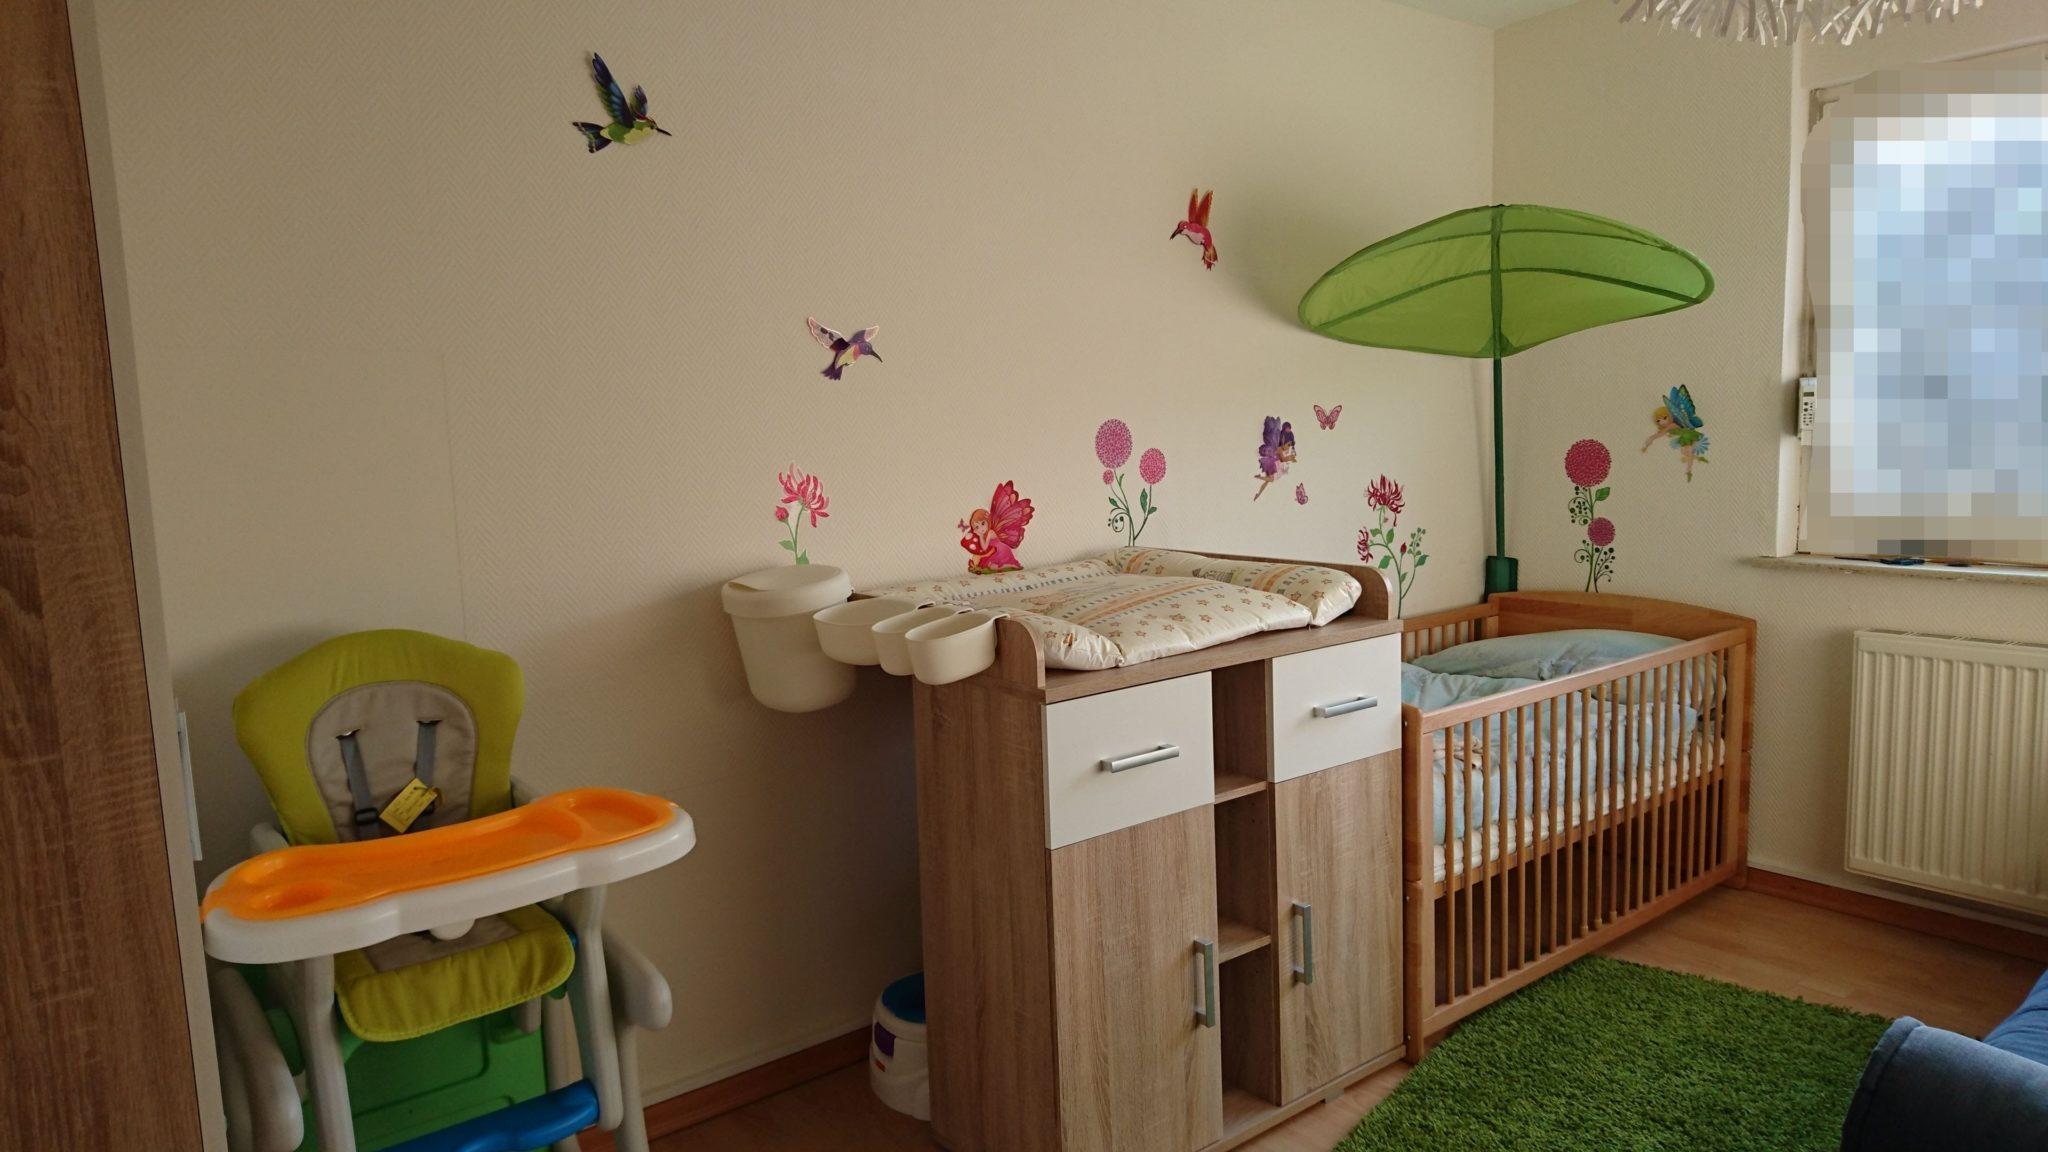 Kinderzimmer fast fertig for Kinderzimmer 1 jahr